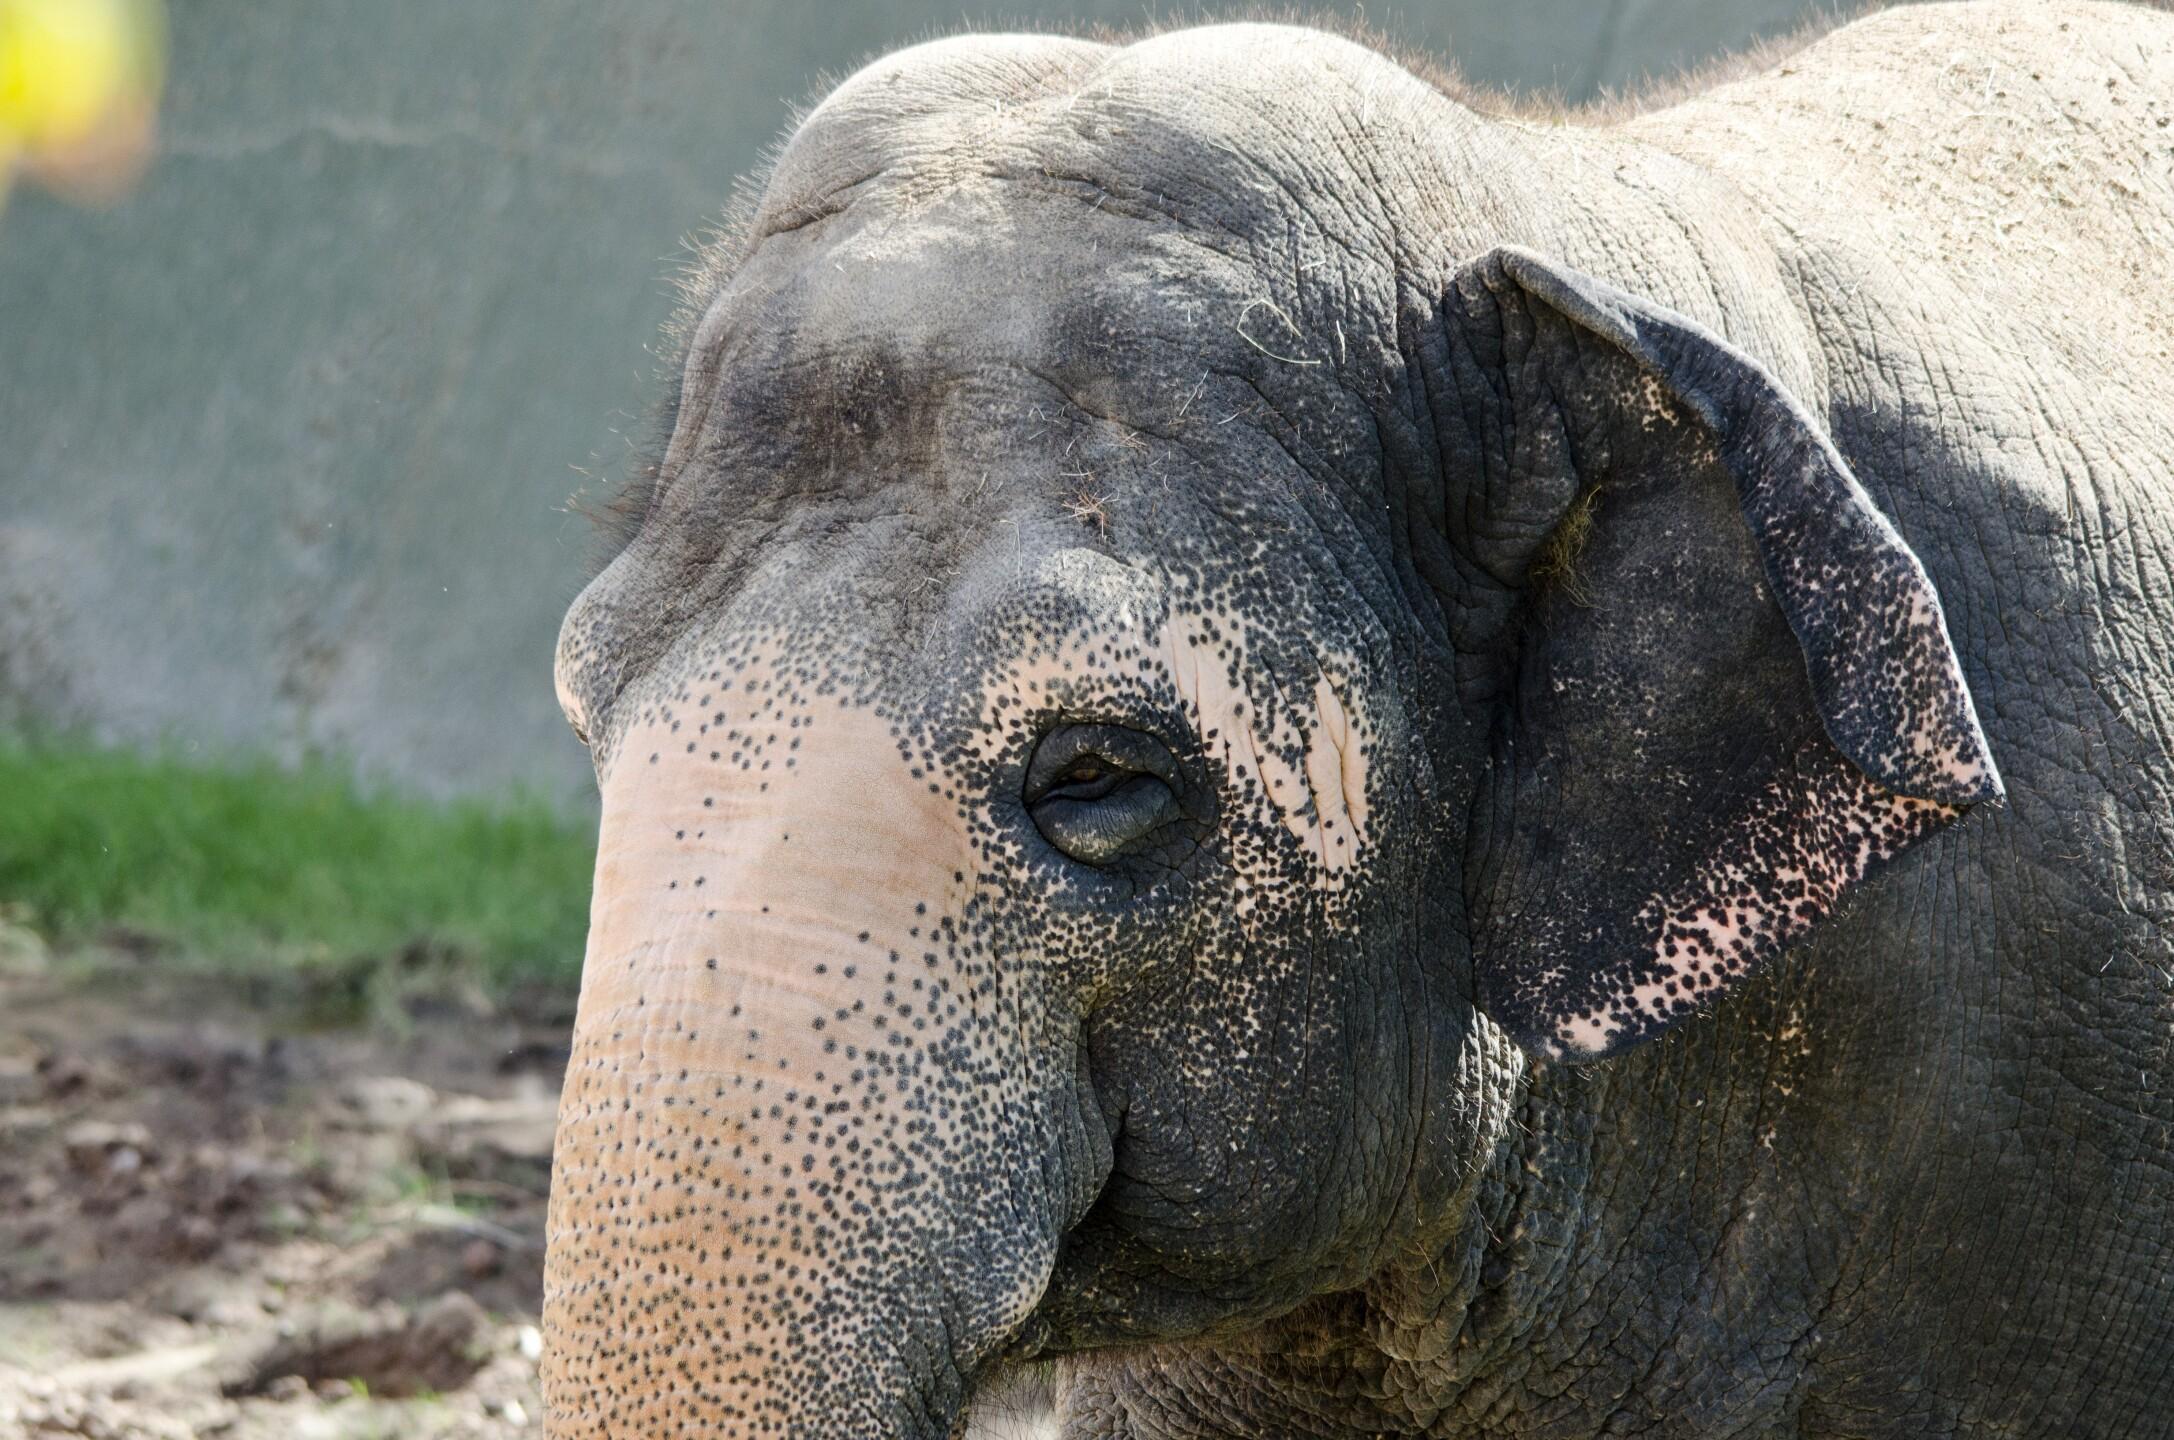 Reba Asian Elephant Phoenix Zoo - Handouts9.jpg